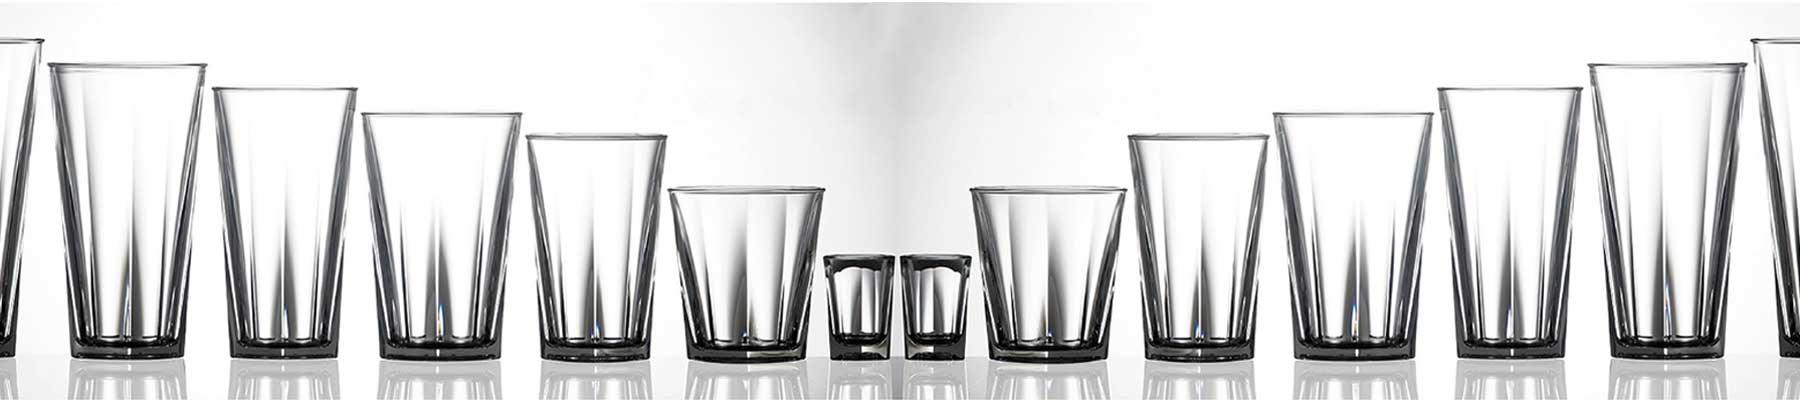 penthouse_tumblers-glassware